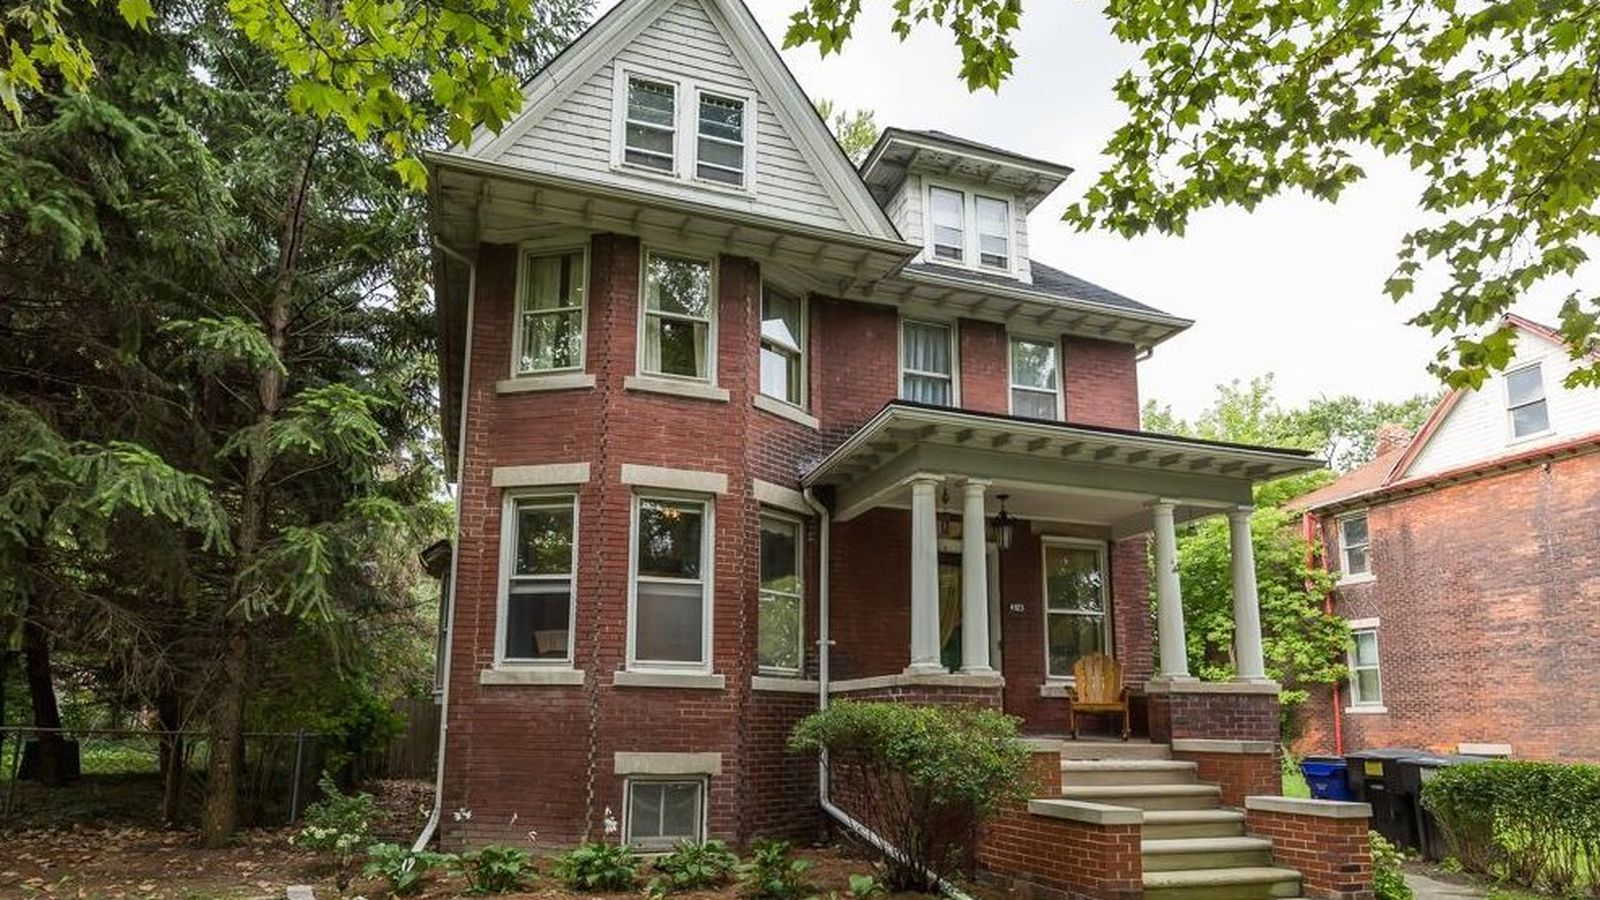 Sweet 109 year old Woodbridge home asks 269K